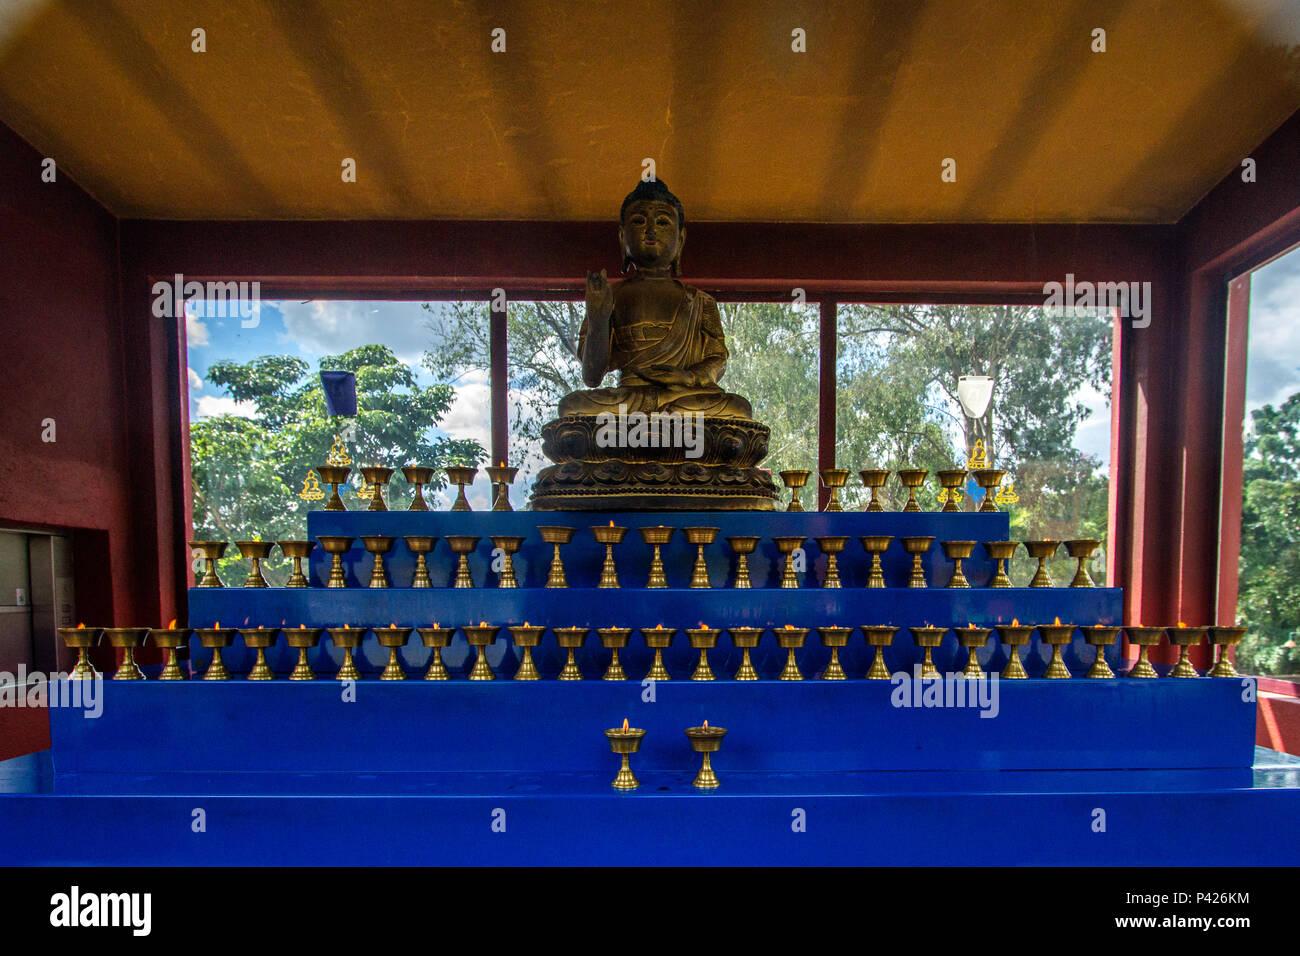 Templo Chagdud Gonpa Odsal Ling, el templo budista tibetano, Cotia, São Paulo. Foto de stock